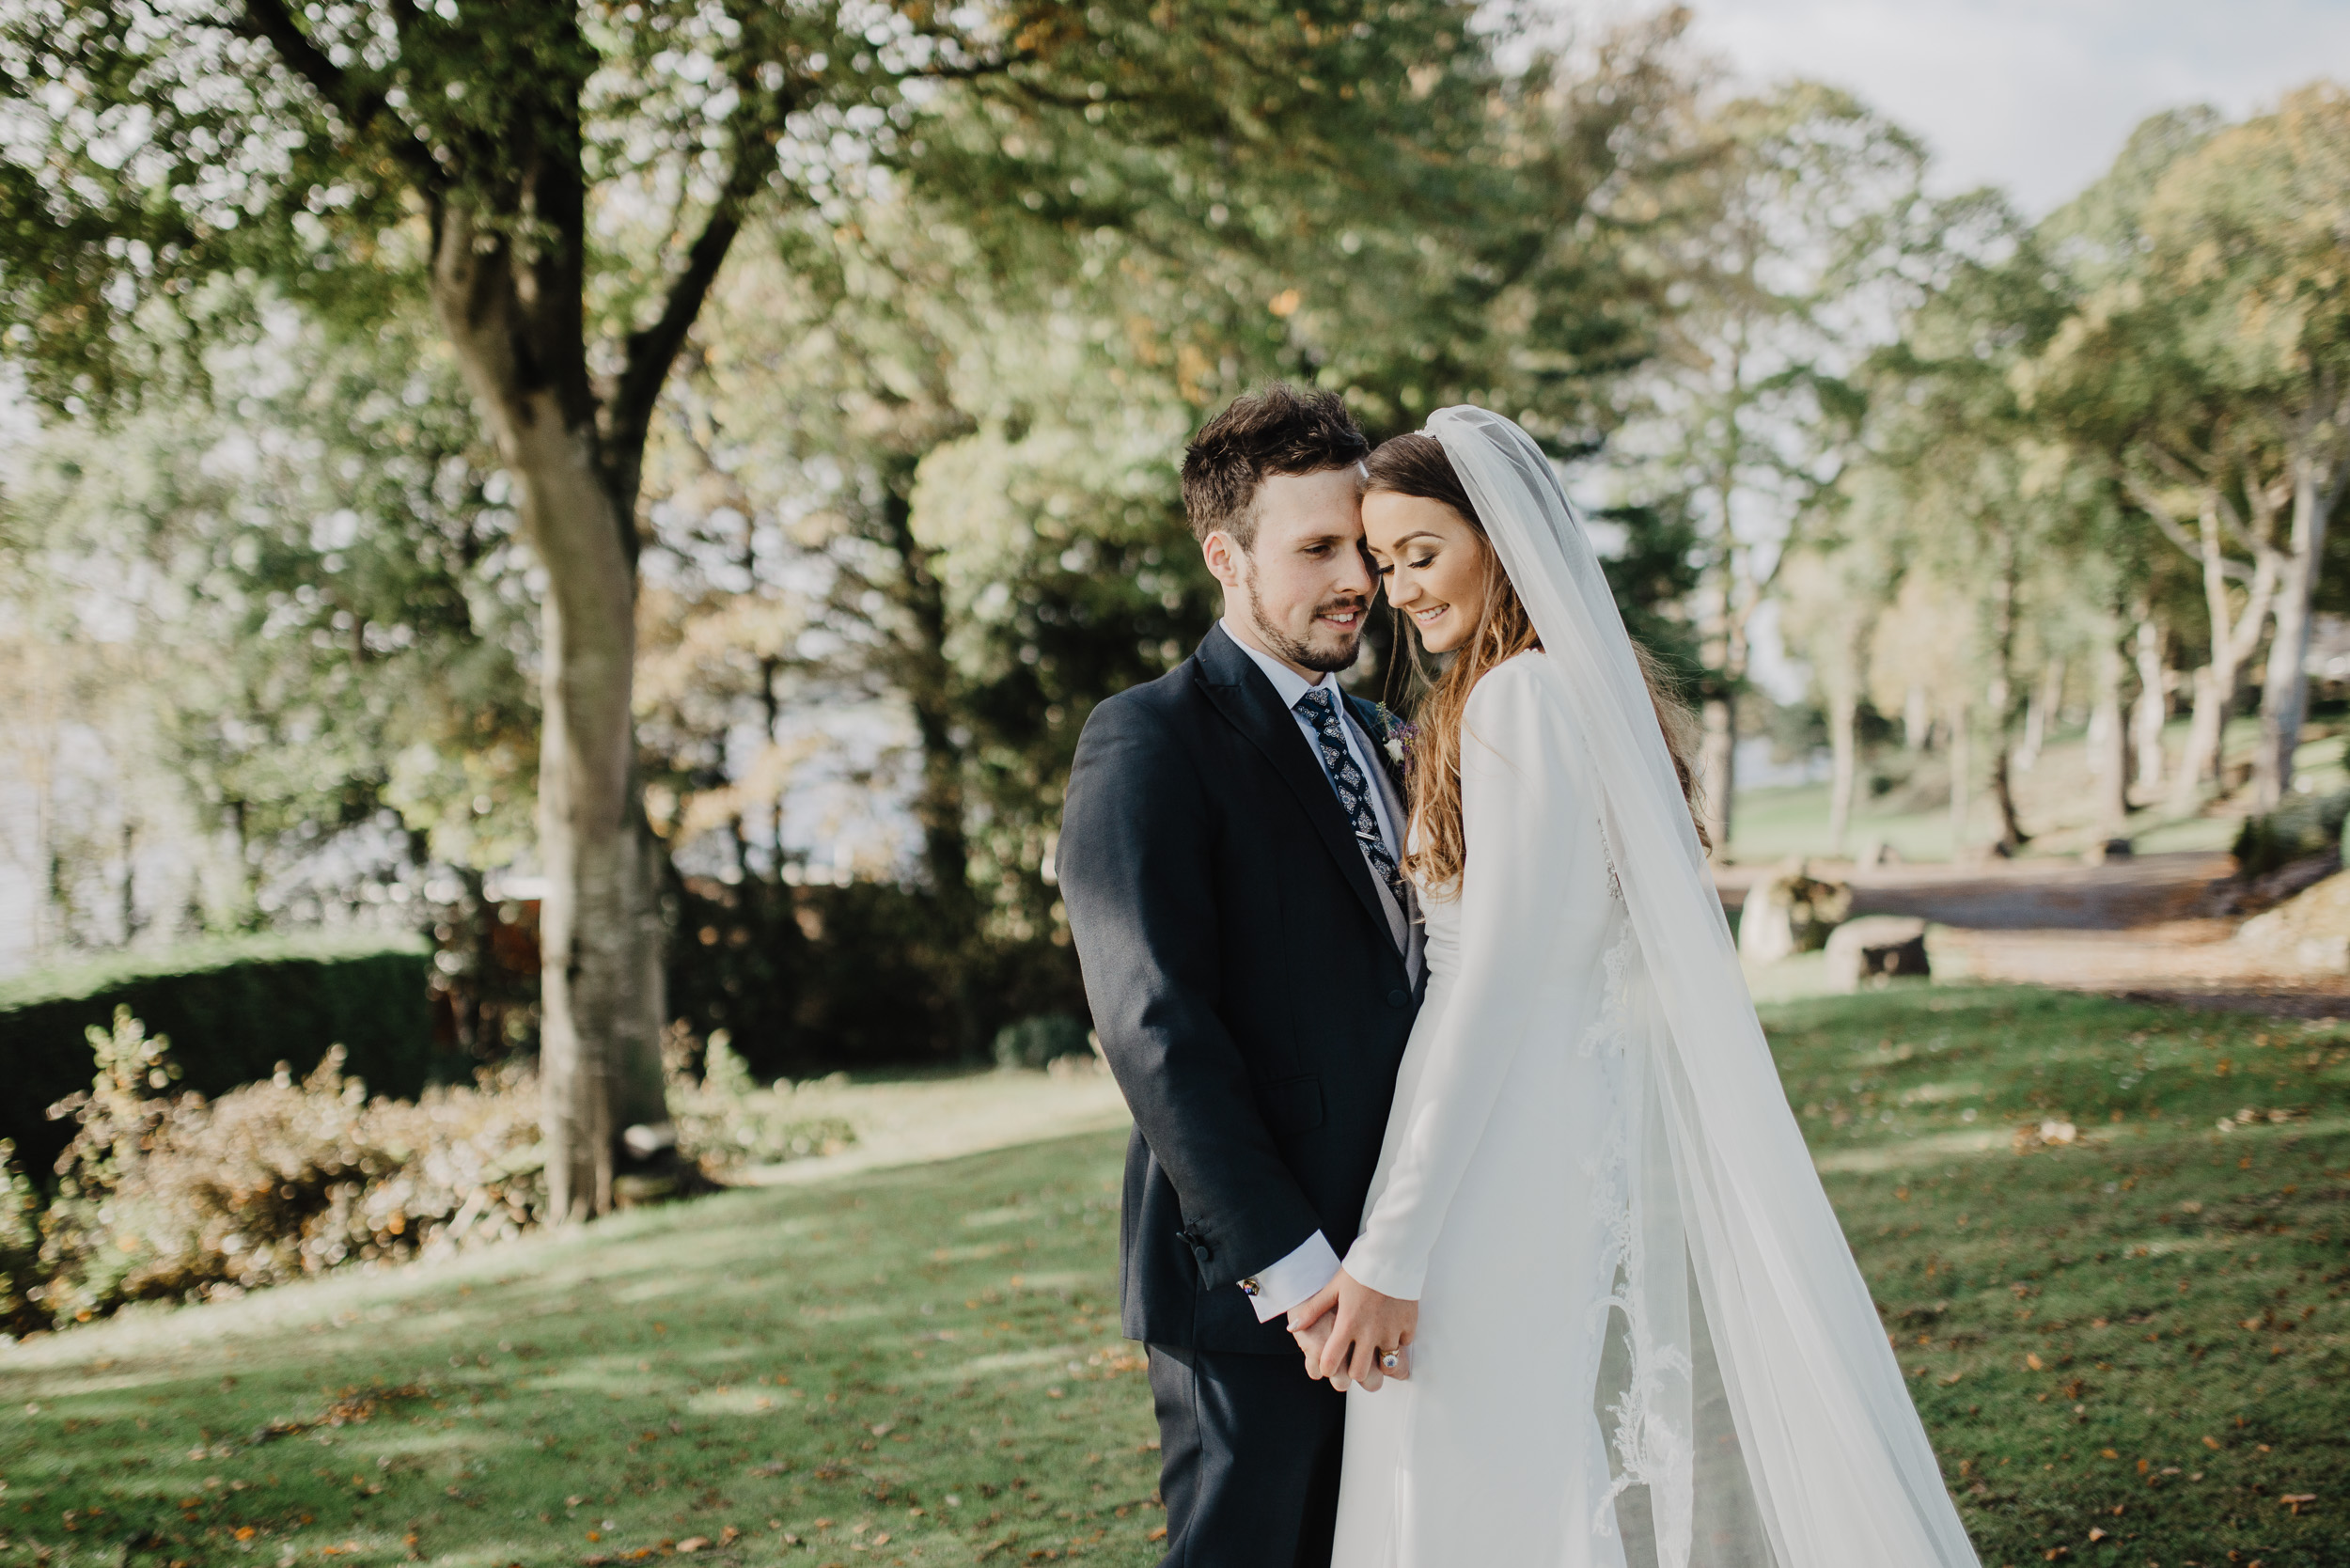 wedding photogaphy peter mackey 2018 sar-4.jpg